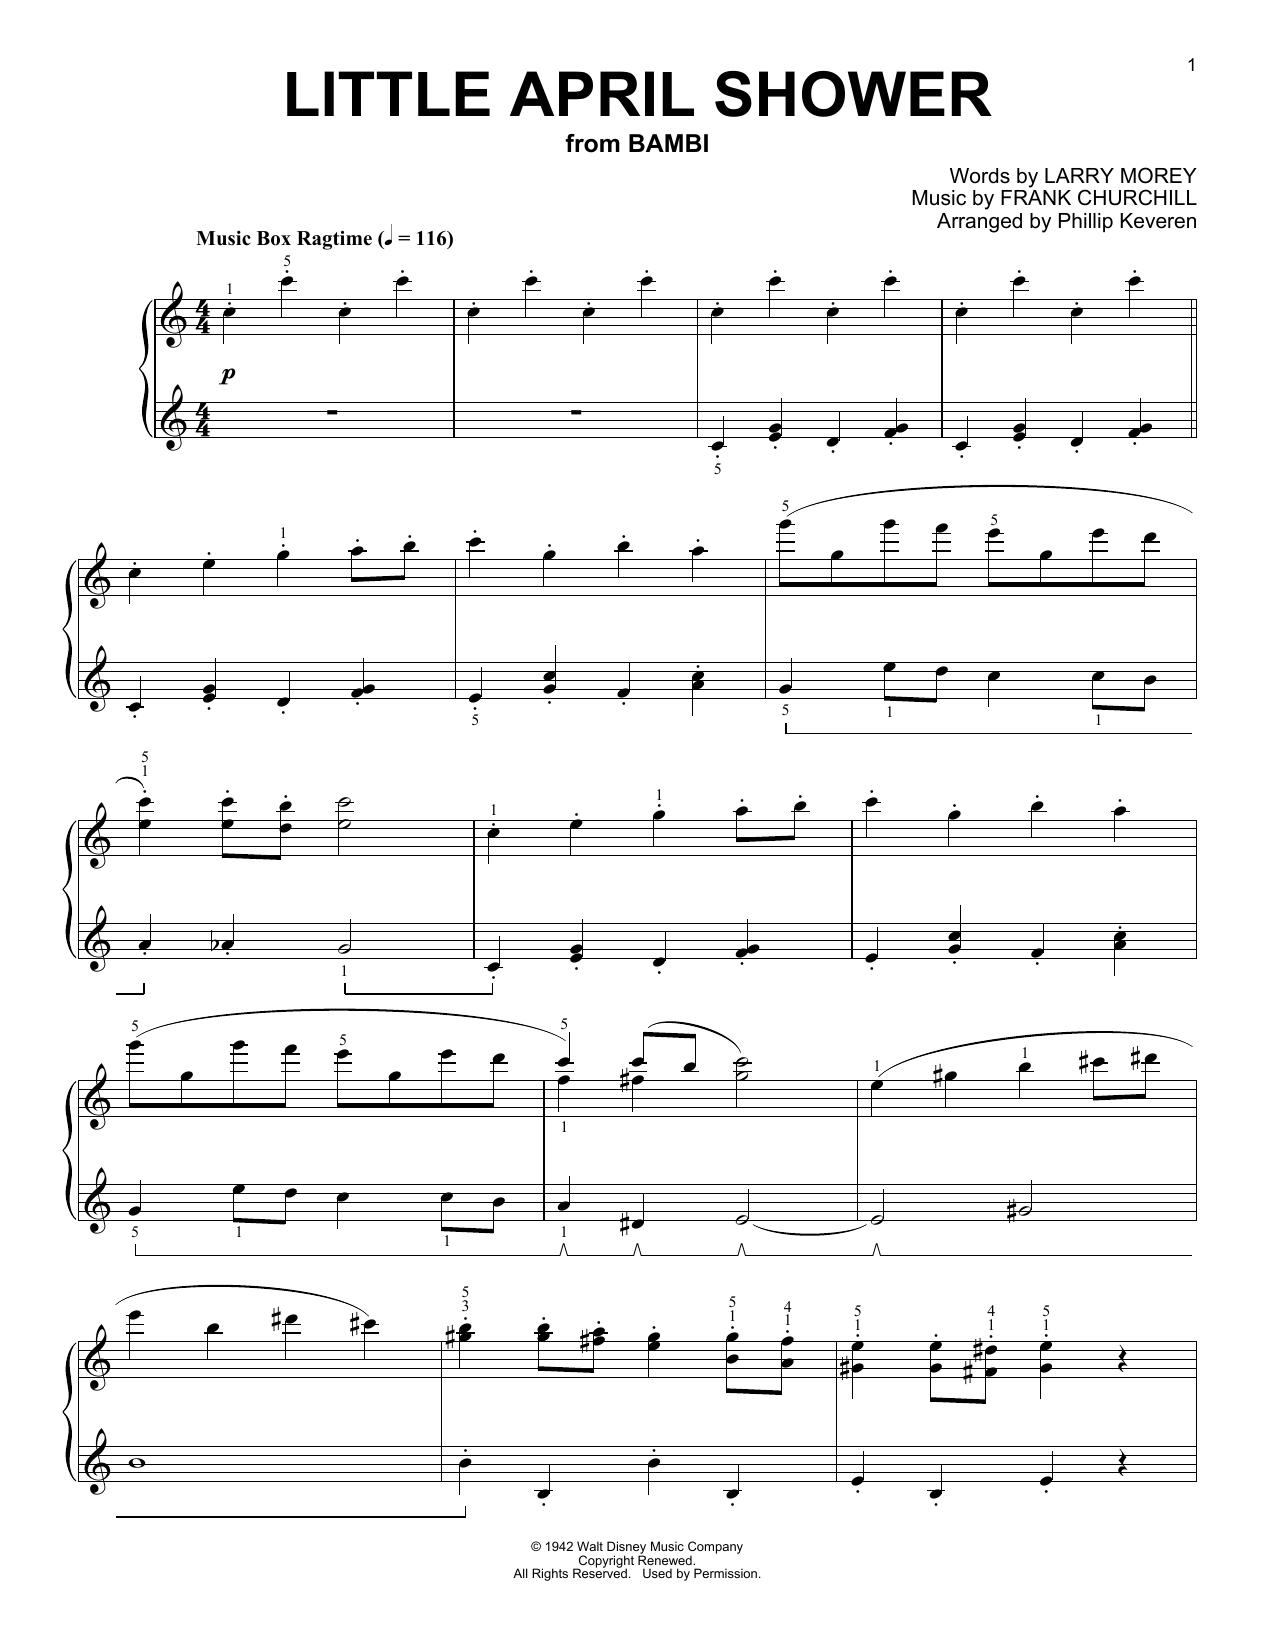 Frank Churchill Little April Shower [Ragtime version] (arr. Phillip Keveren) sheet music notes and chords. Download Printable PDF.